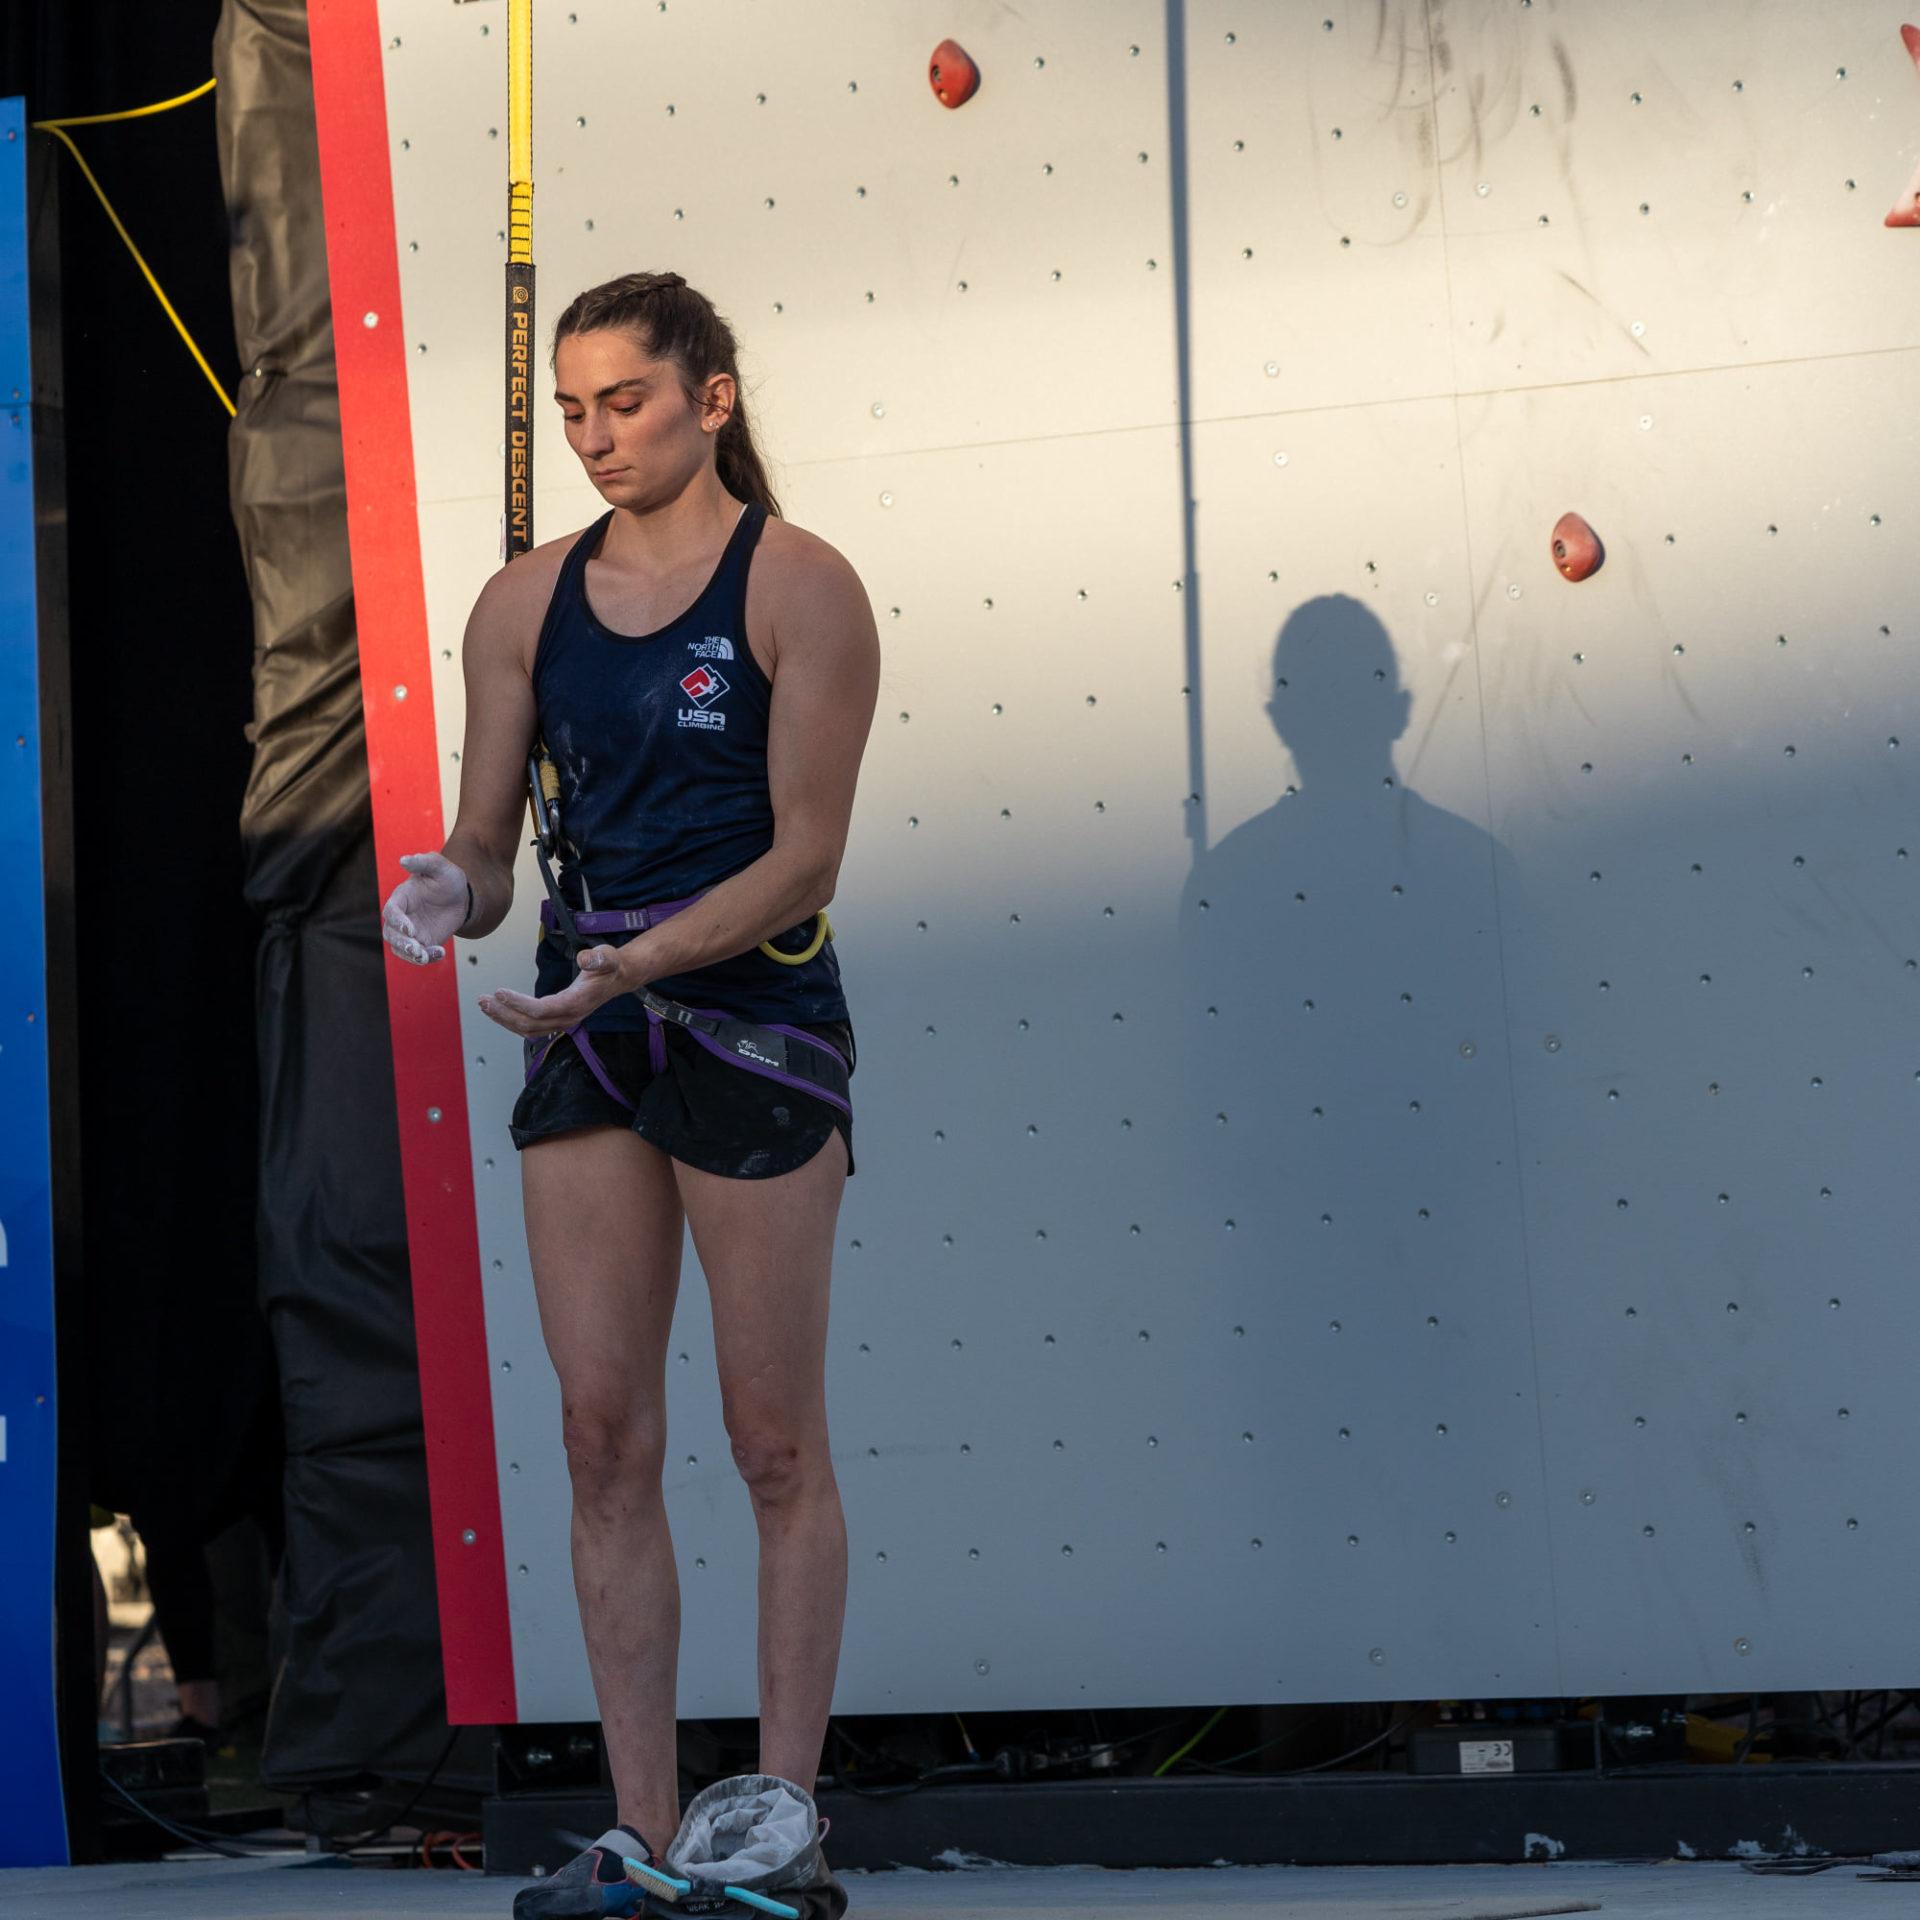 USA female climber chalking hands